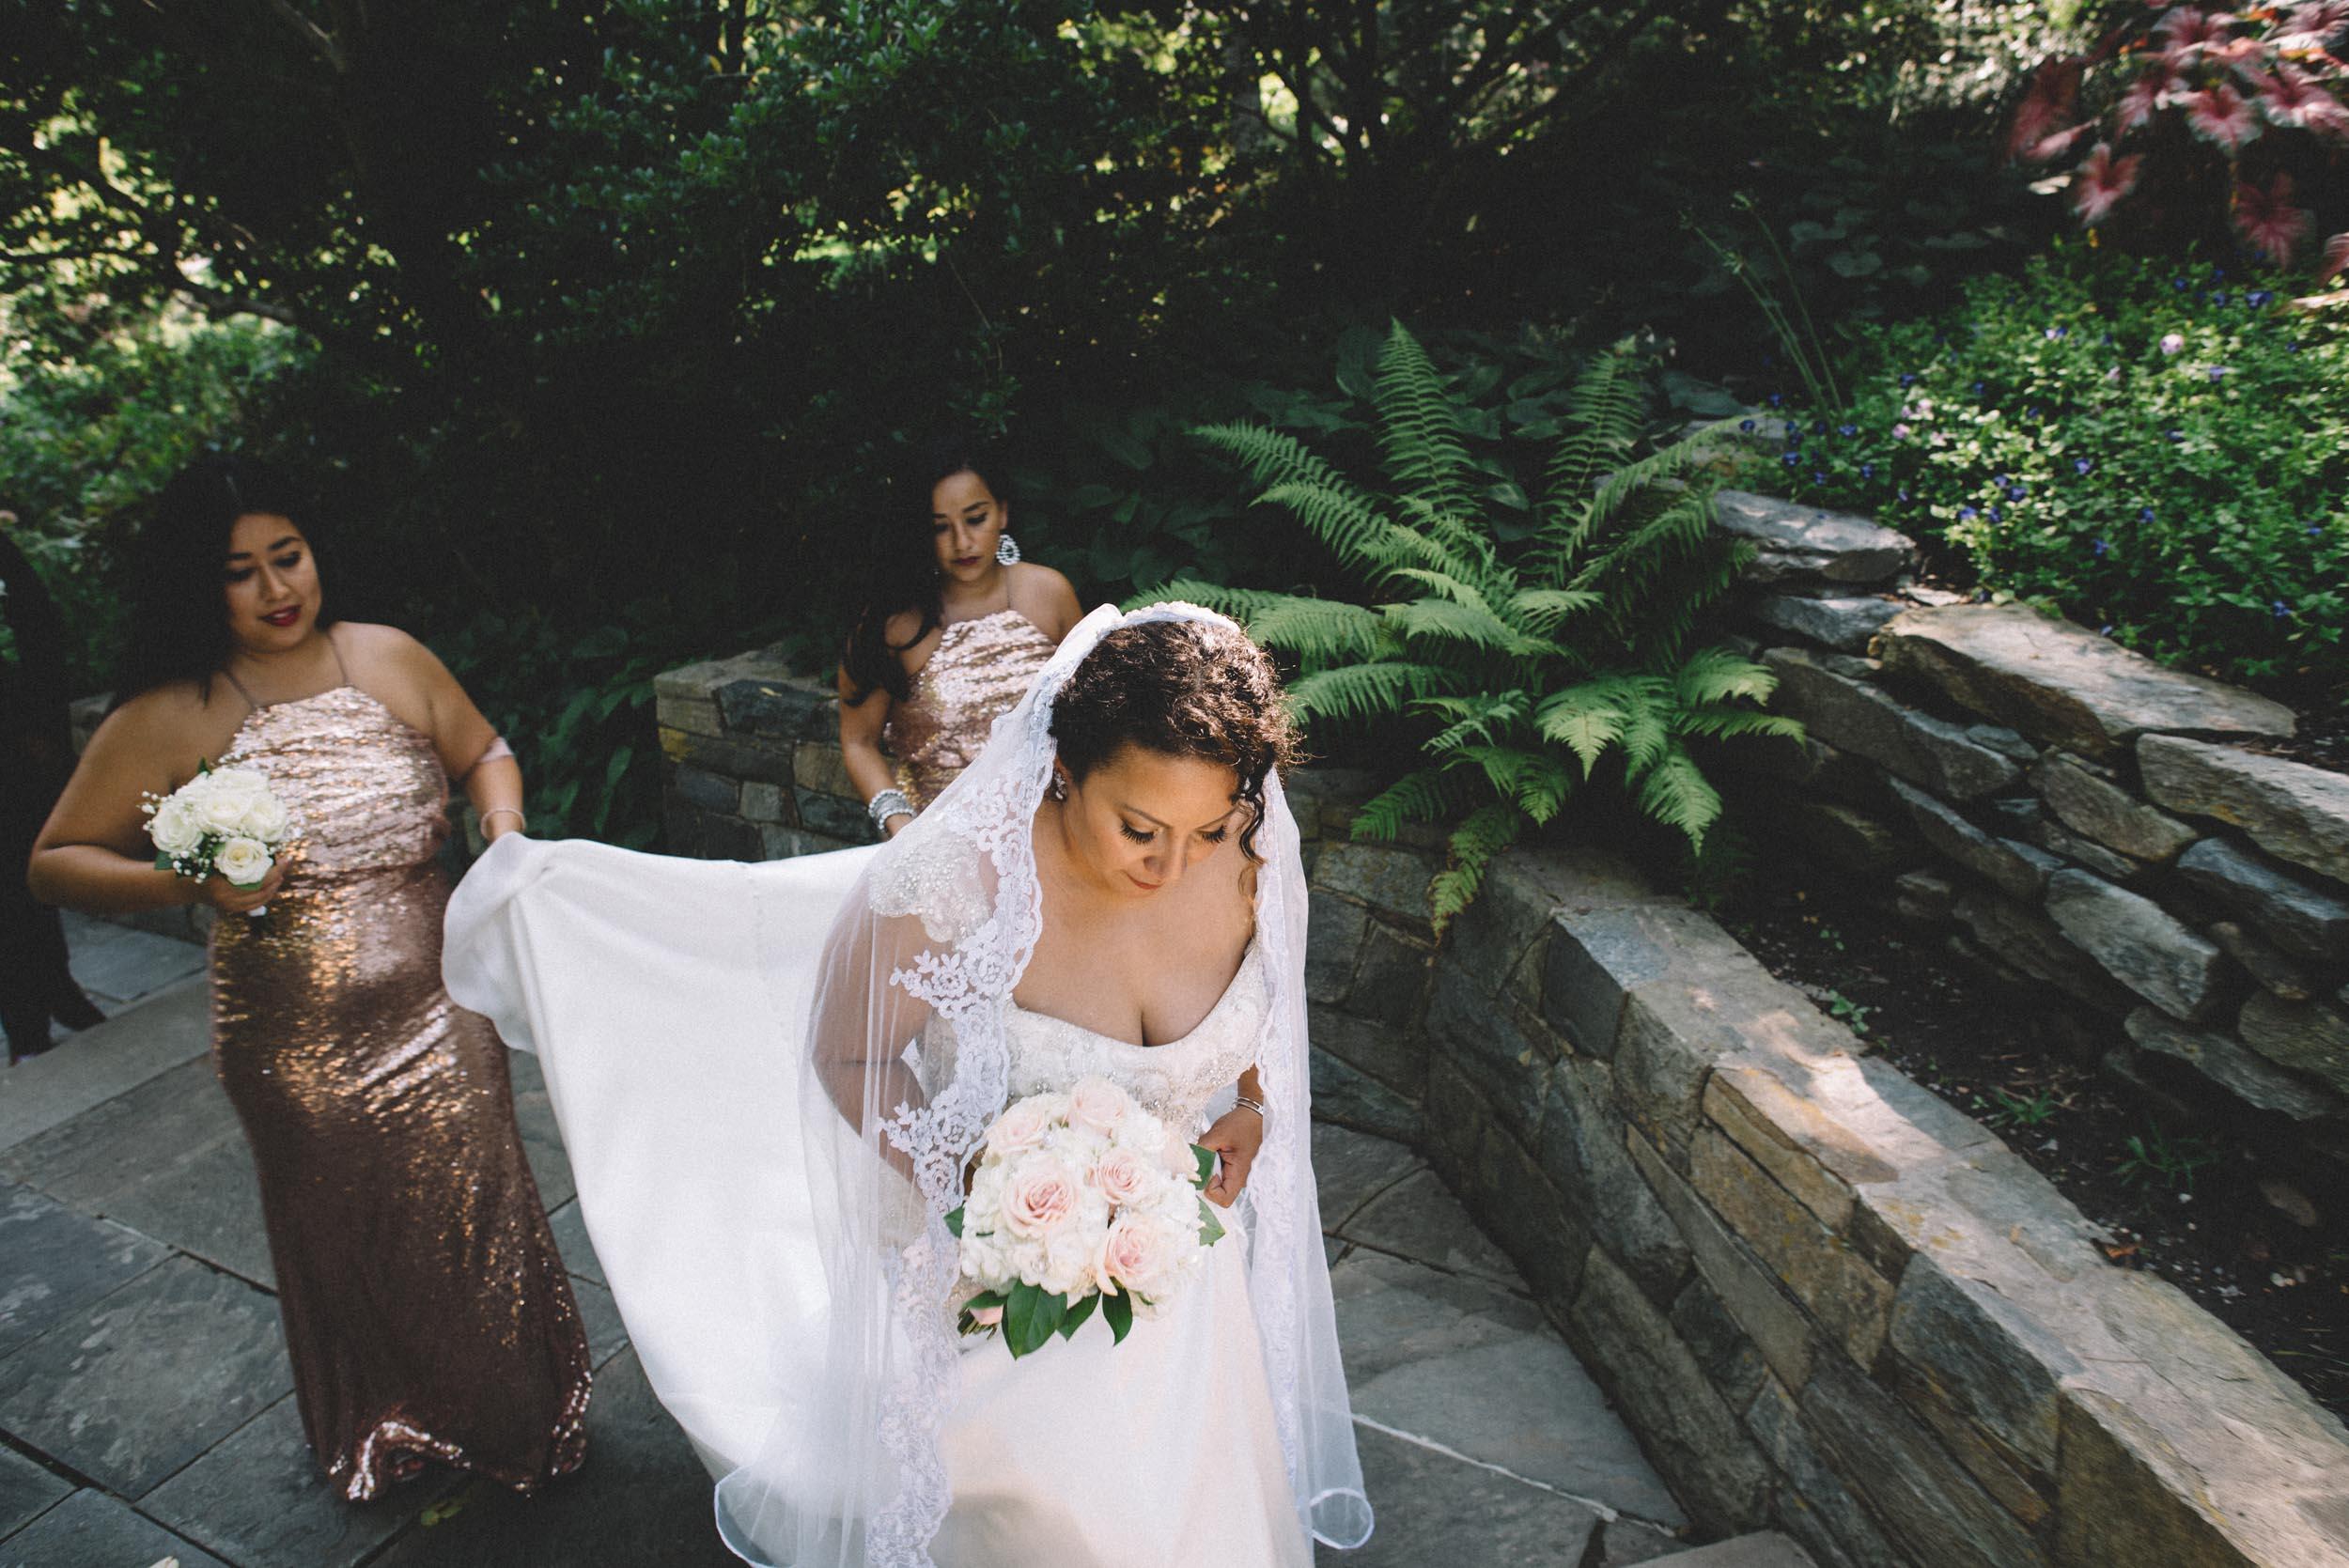 Maryland-wedding-photographer-32.jpg